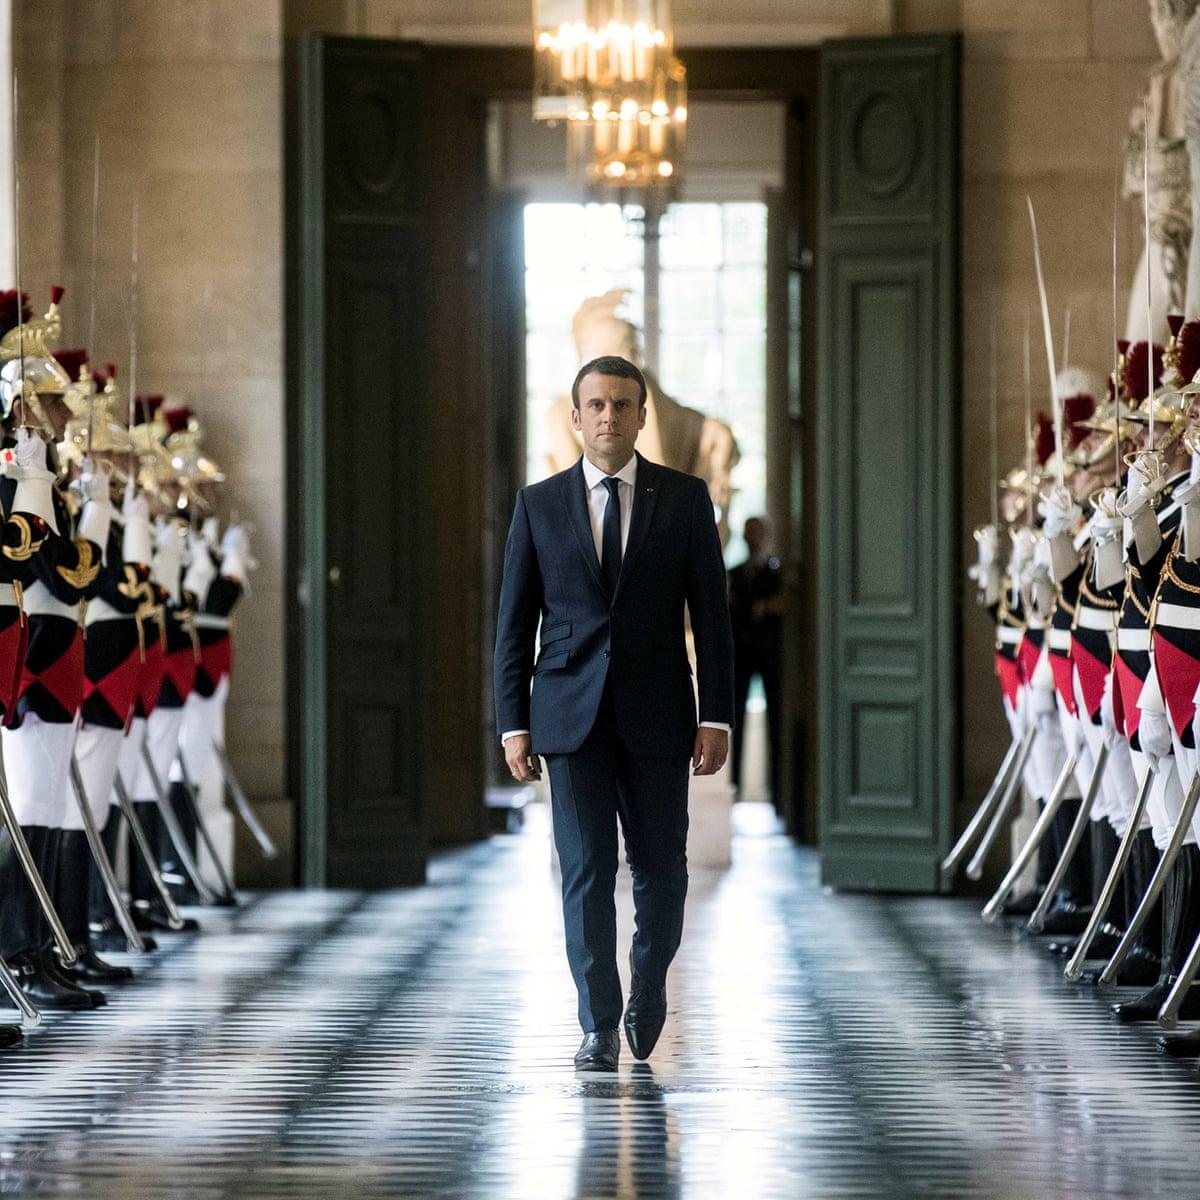 Emmanuel Macron Vows To Transform France In Versailles Speech Emmanuel Macron The Guardian